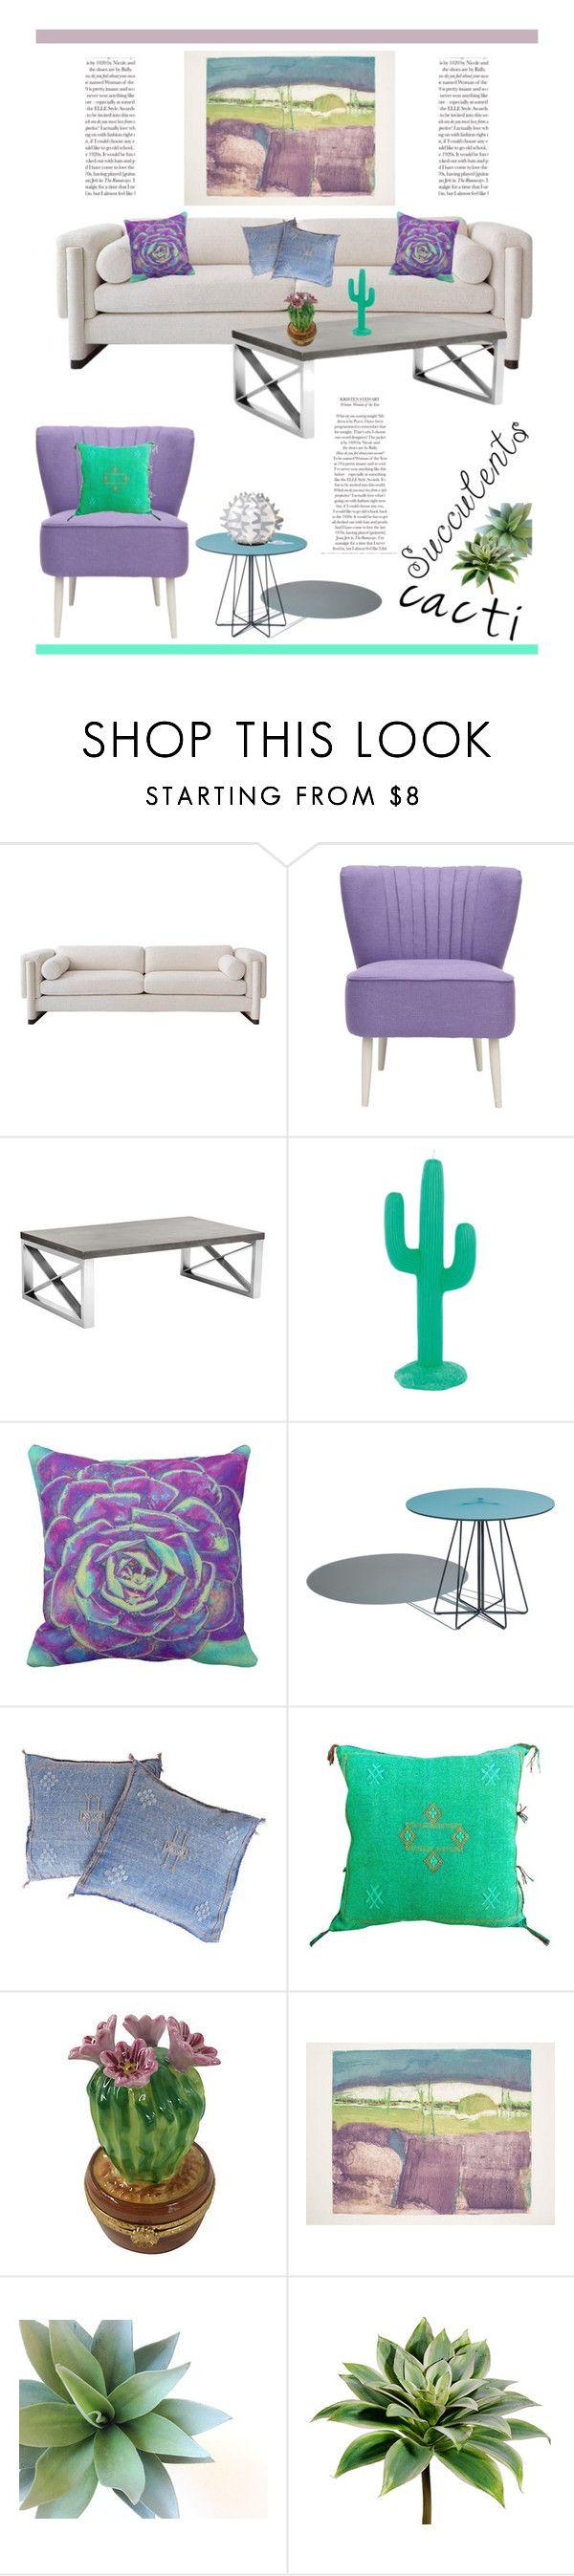 """Cacti + Succulents"" by dianefantasy on Polyvore featuring interior, interiors, interior design, home, home decor, interior decorating, Safavieh, Sunpan, Sunnylife and Slamp"